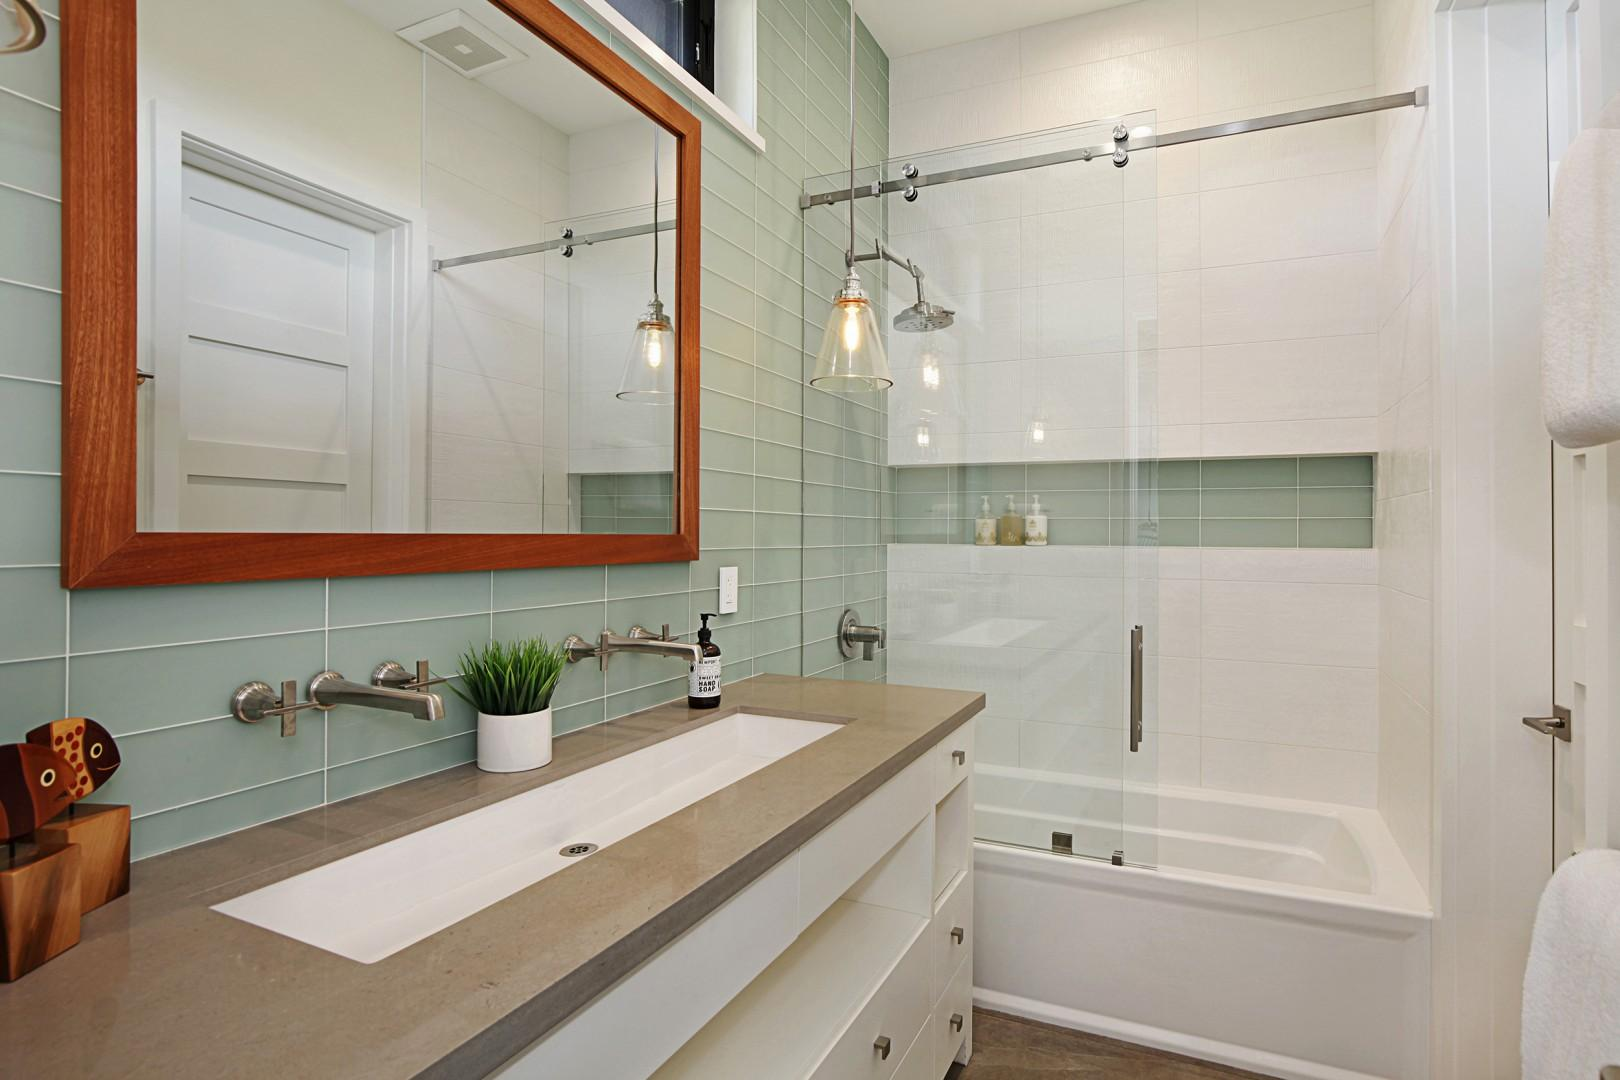 Bunk room bathroom with tub